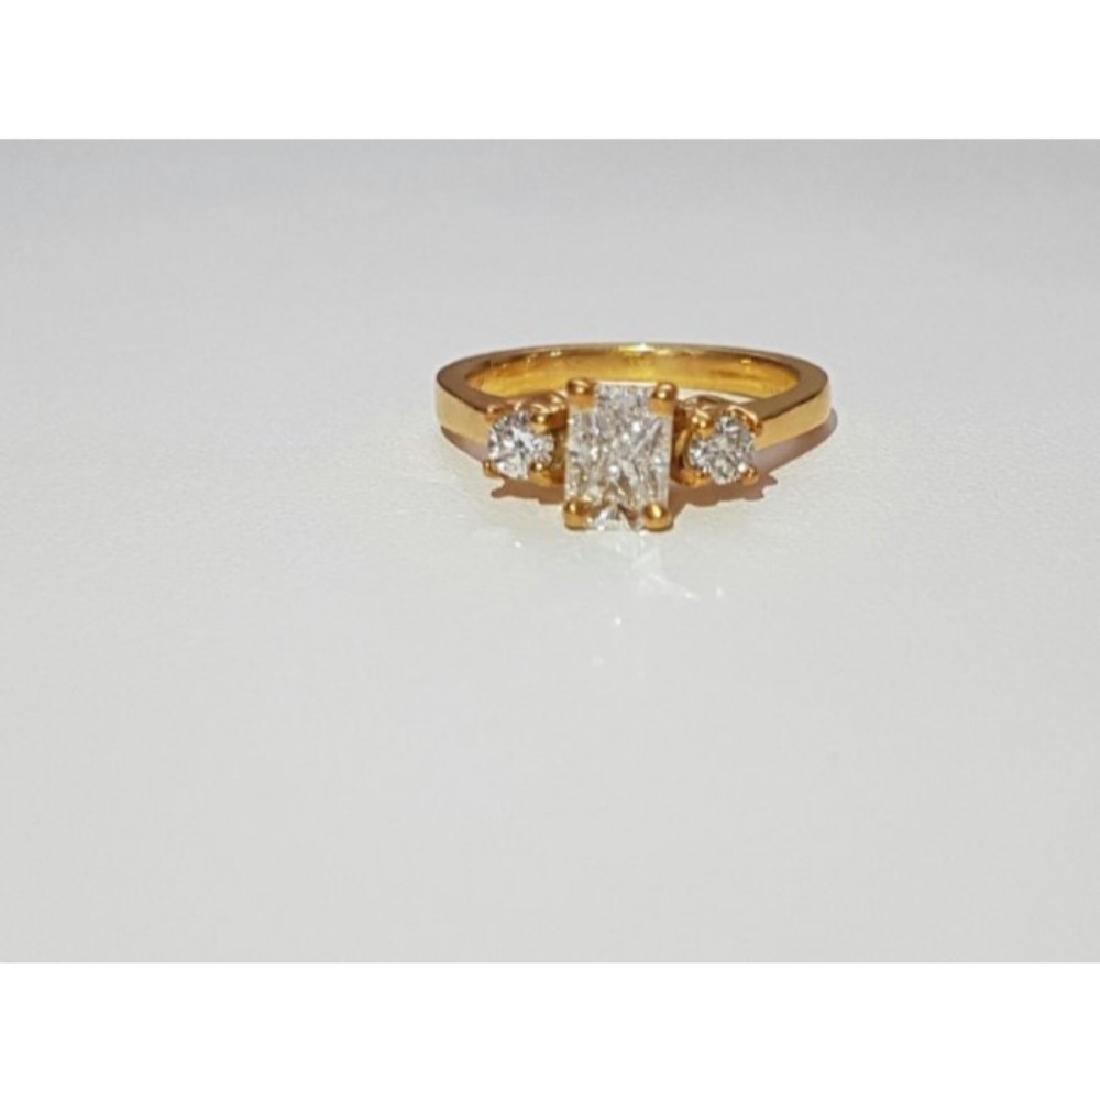 14K Gold and 1.20 Carat VVS White Diamond Ring (GIA)